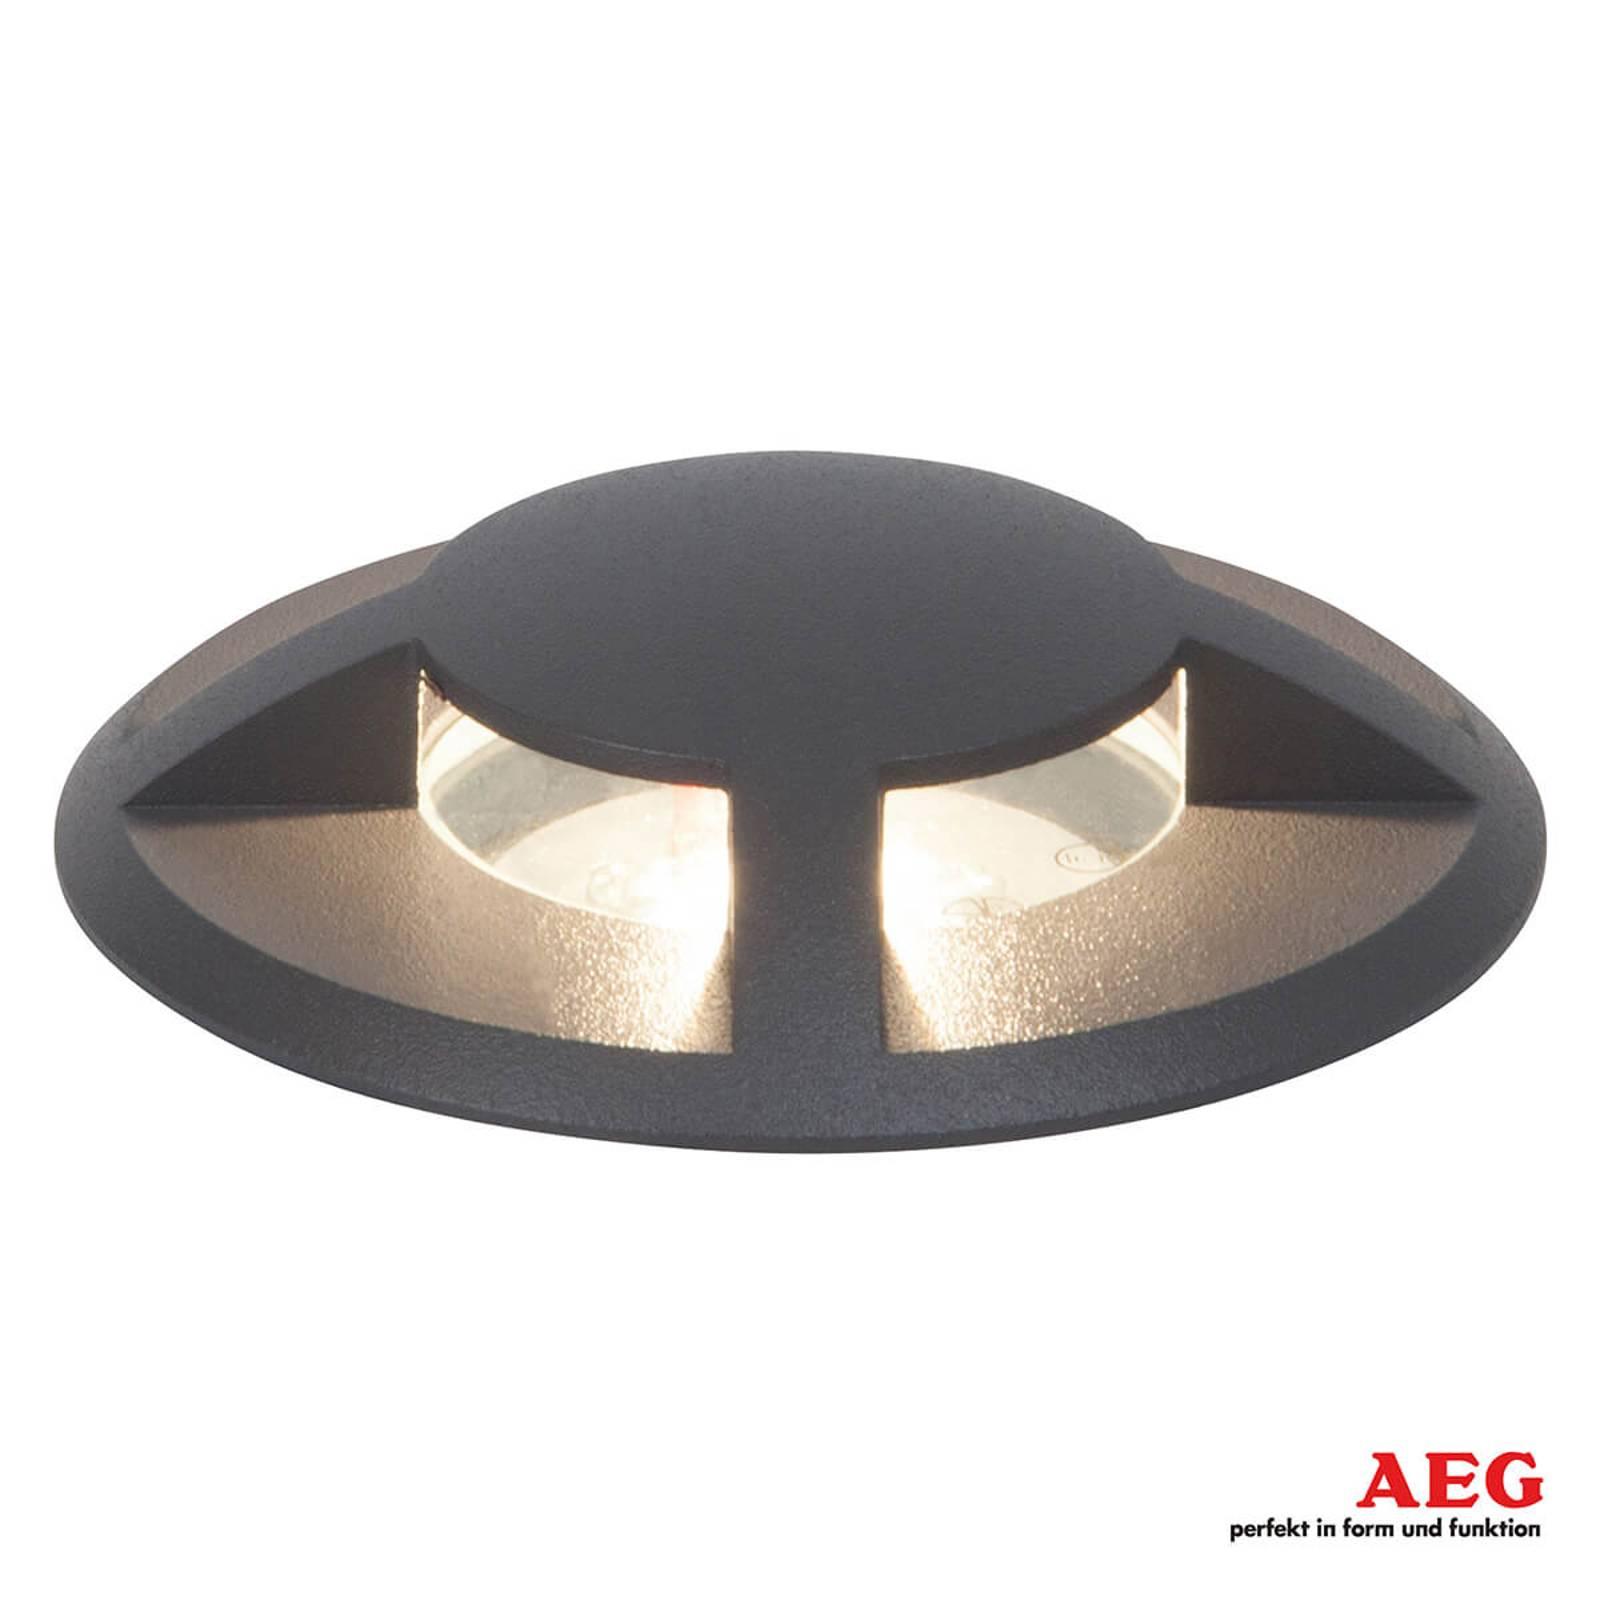 AEG Tritax - LED grondspot inbouwlamp, vierzijdig